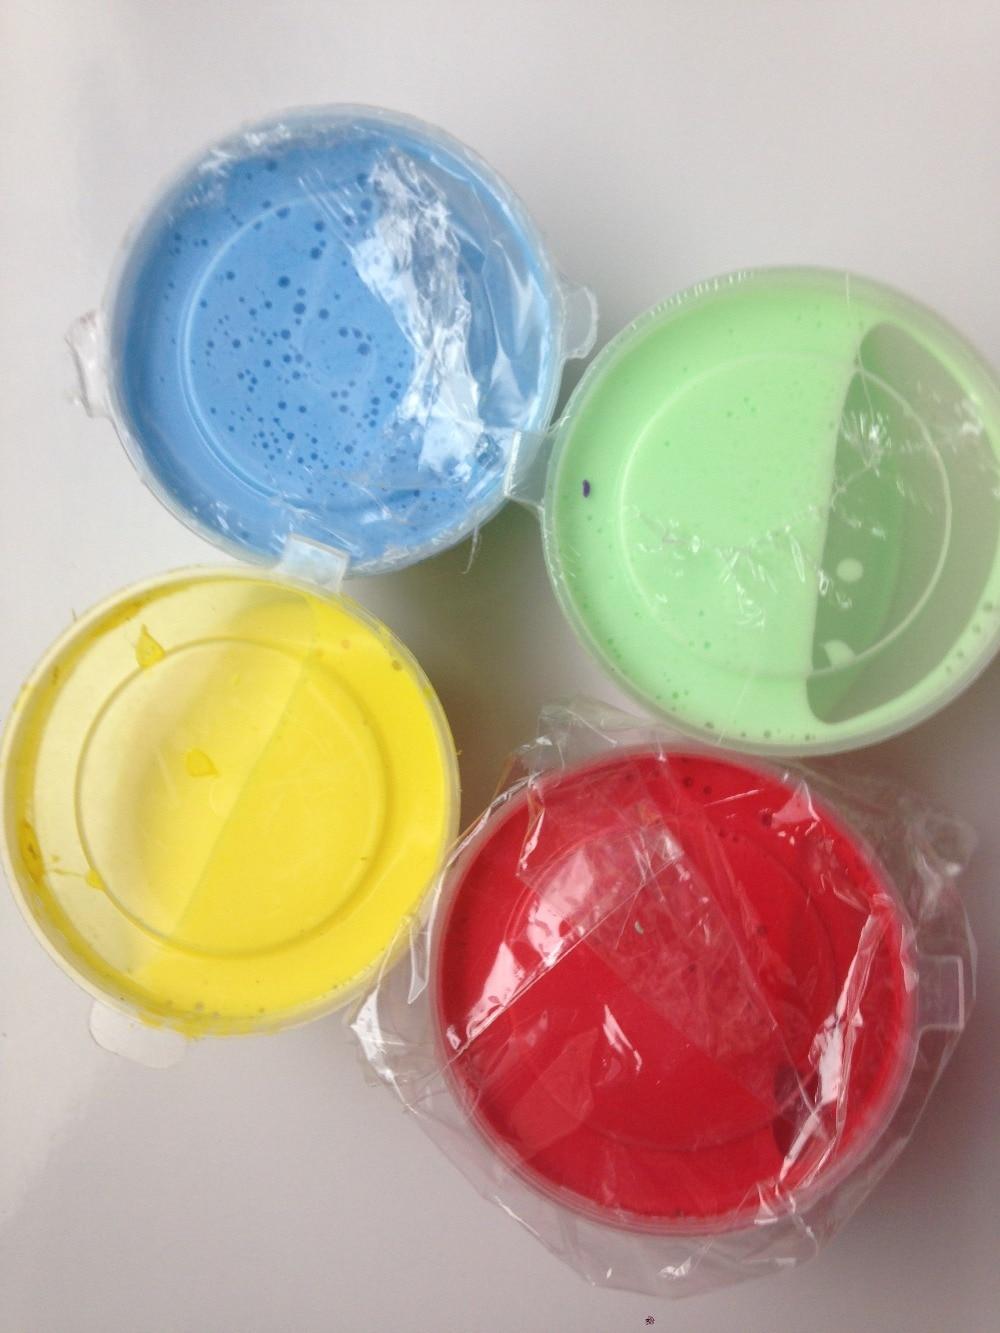 40box 40g box soft butter slime form crystal soil squishy lab